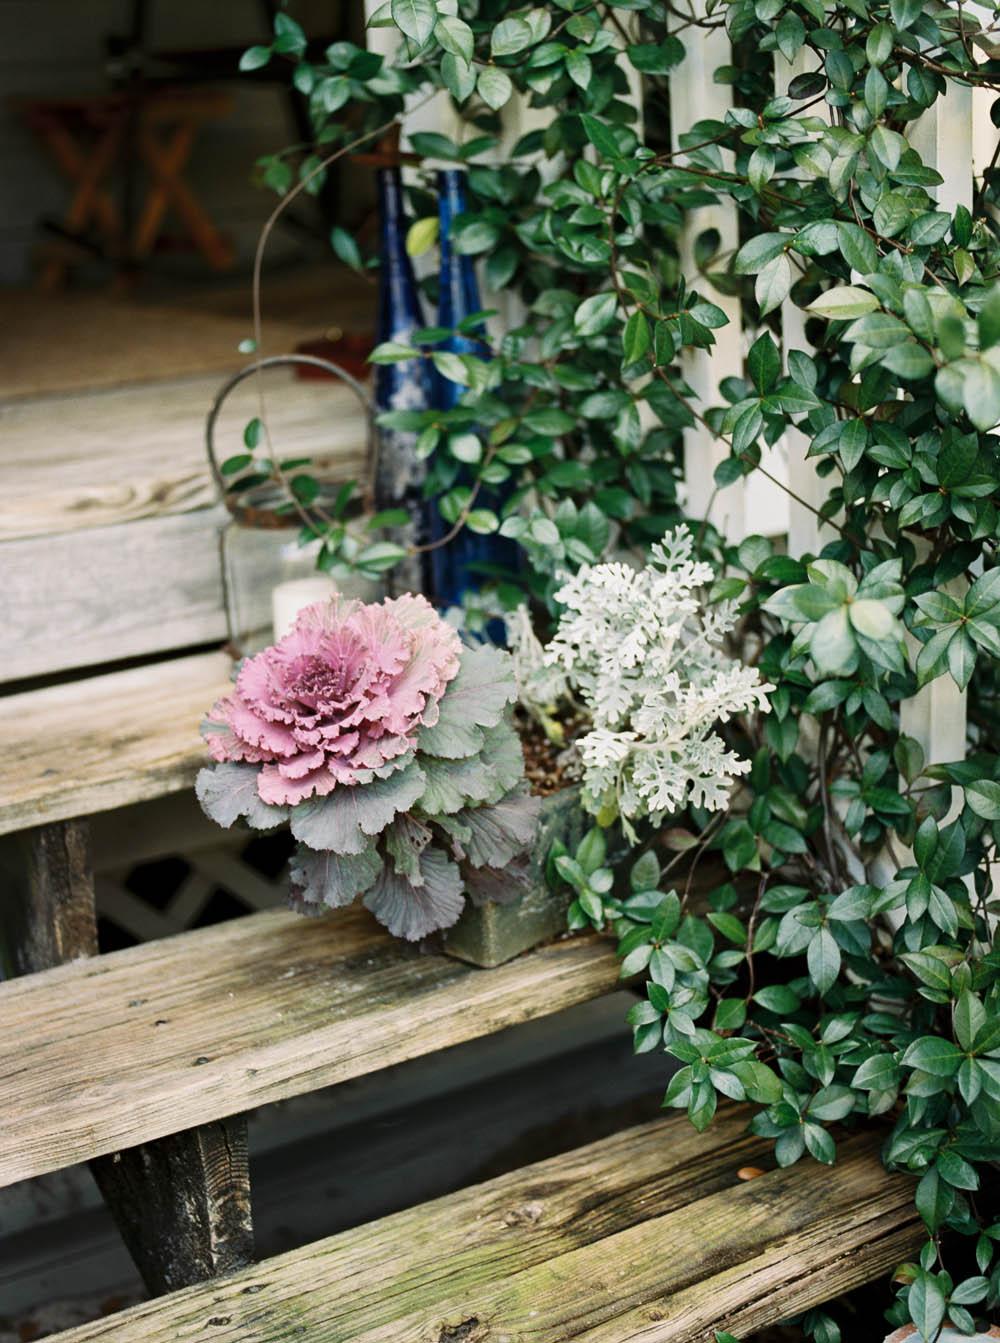 web grayton beach 30a florist lifestyle photography day in the life editorial film ©2016abigailbobophotography-14.jpg